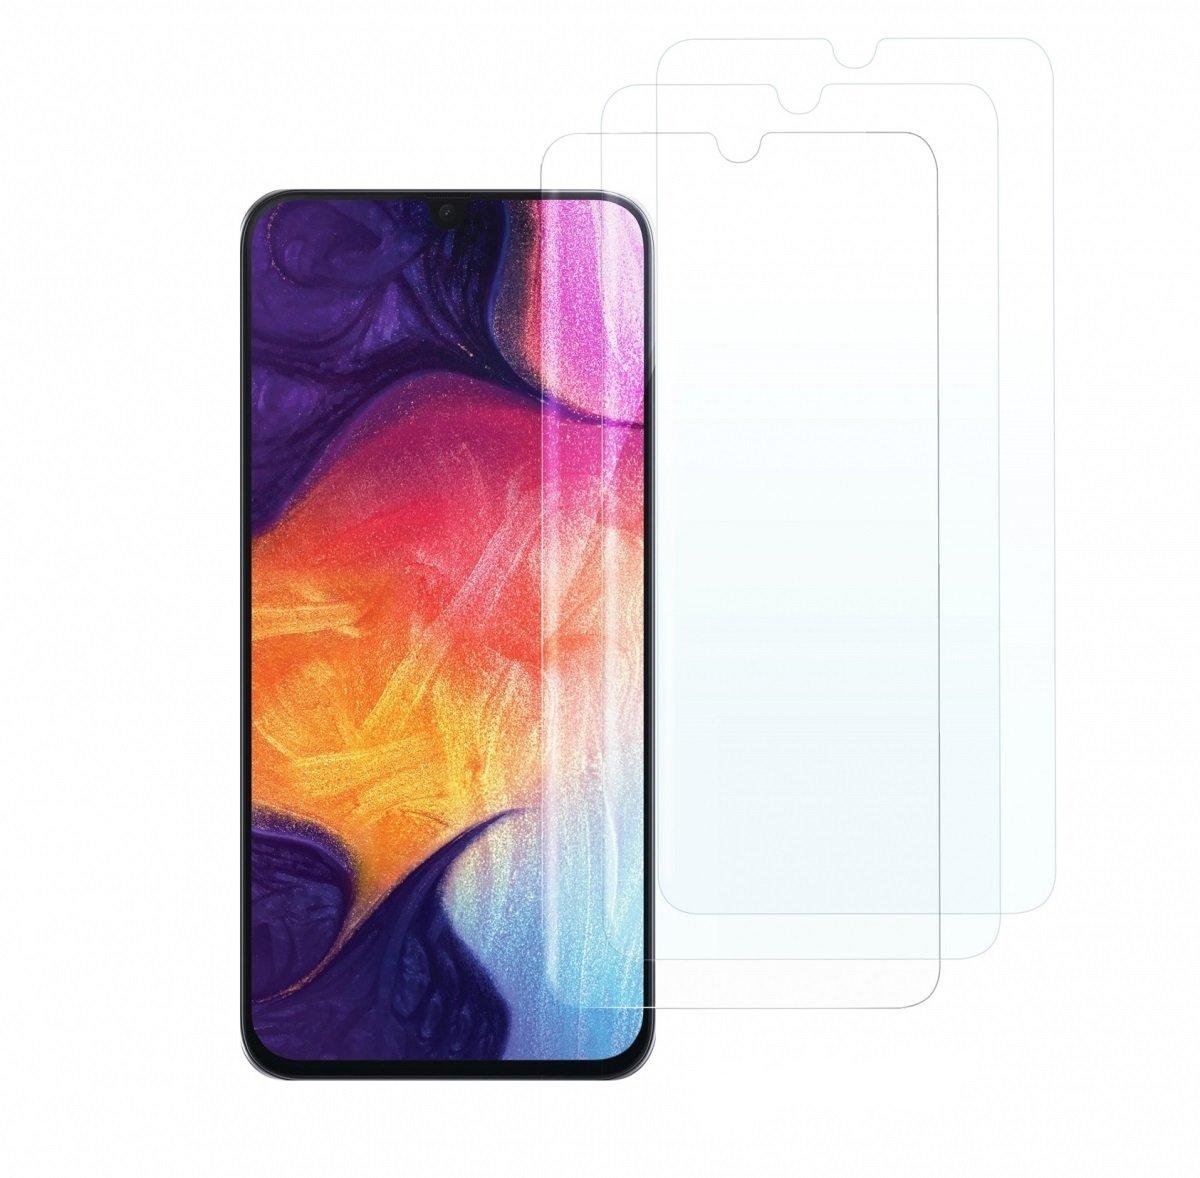 Комплект защитных стёкол 2E для Galaxy A30 (A305)/A50 (A505) 2.5D Clear фото 1